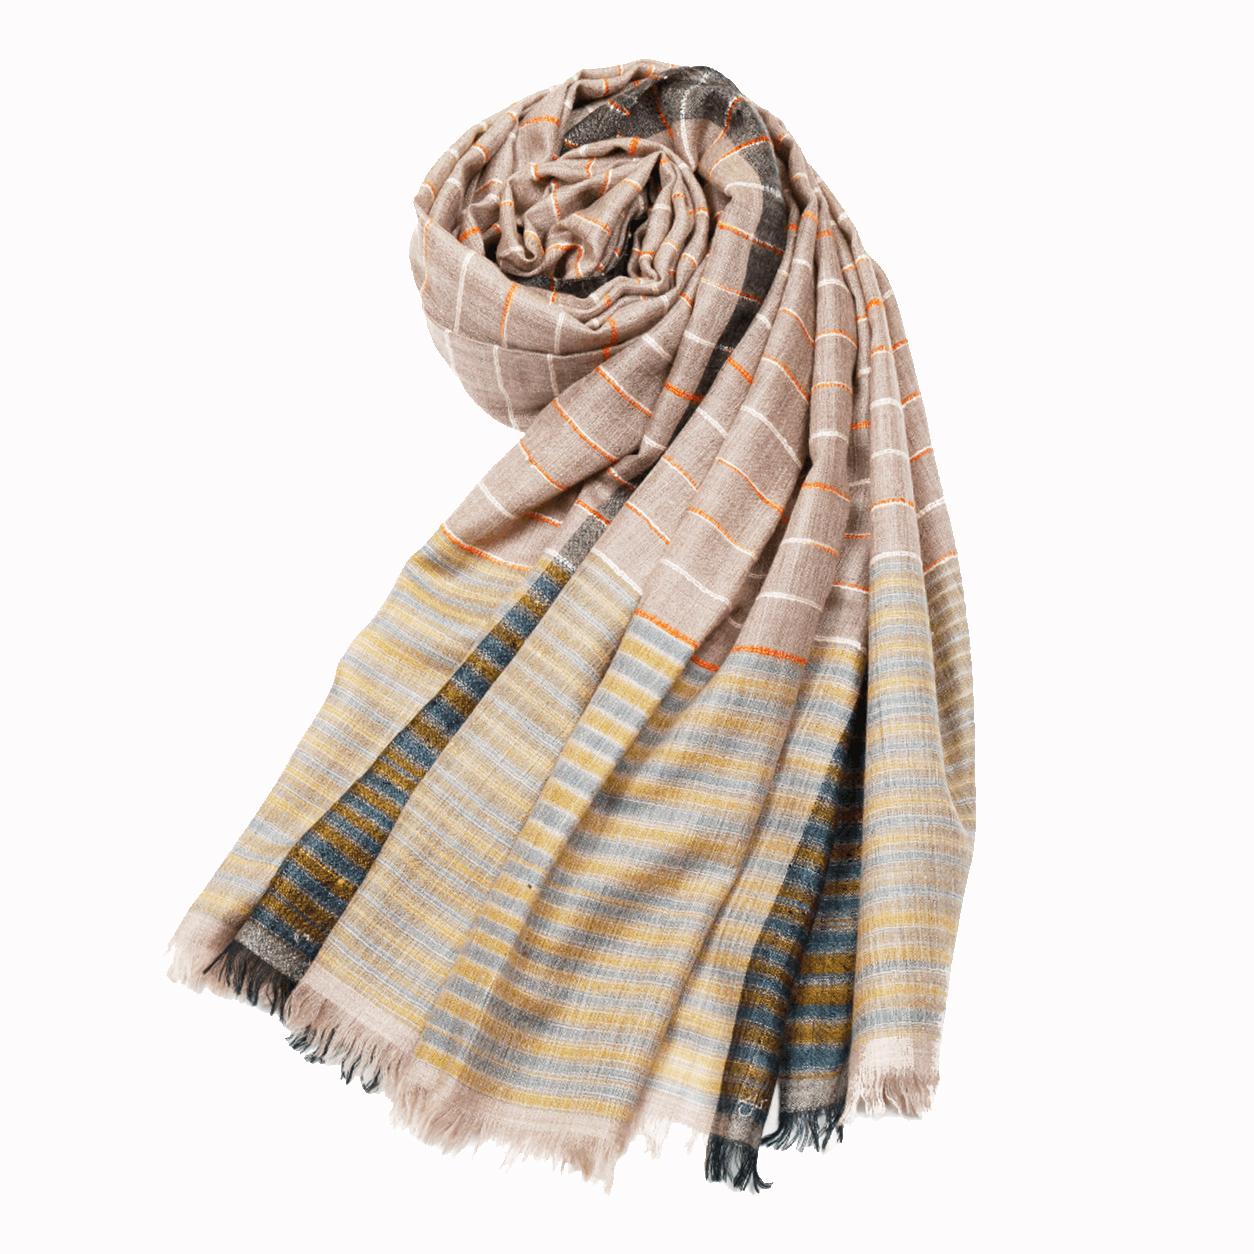 Kashmir Loom natural stripes pashmina stole